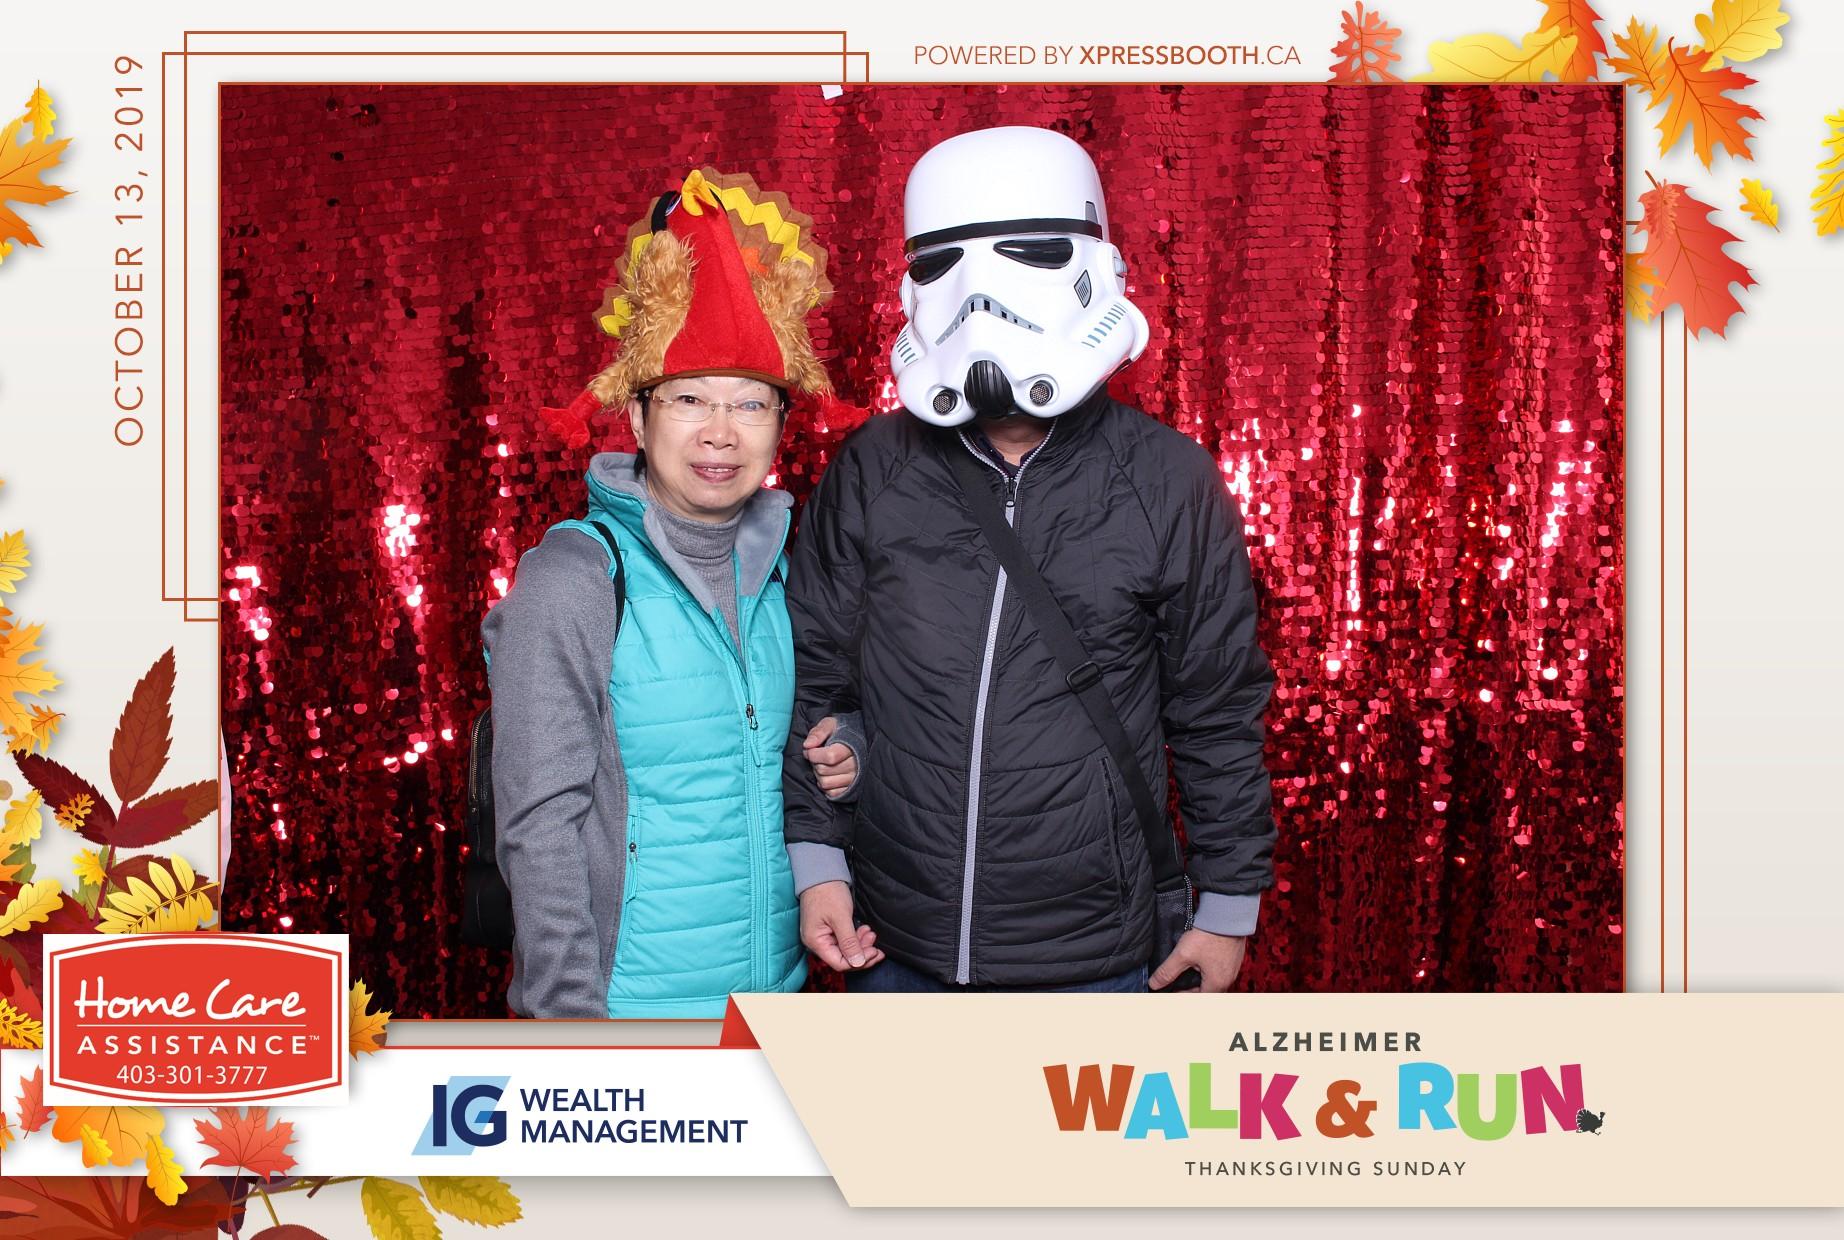 WalkRunAlzheimerSociety-0185-PRINT